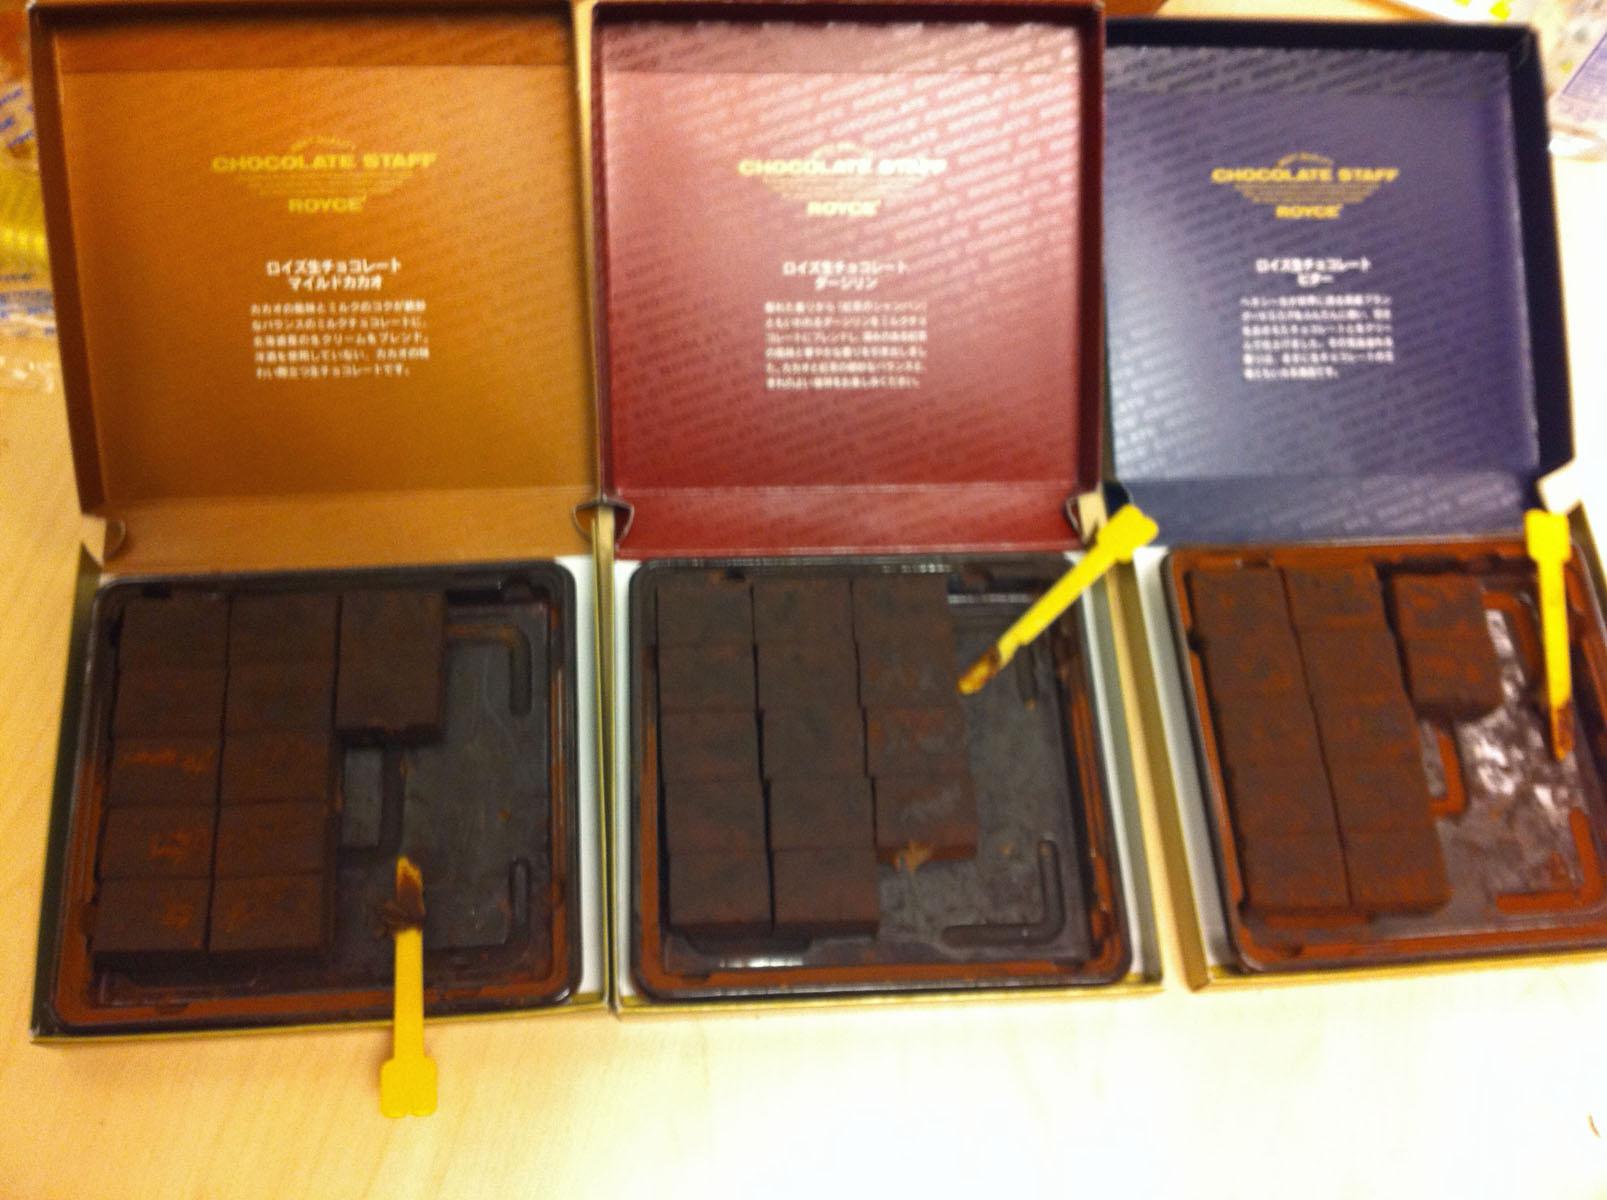 Royce Nama Chocolate   Chocolate I Have Known